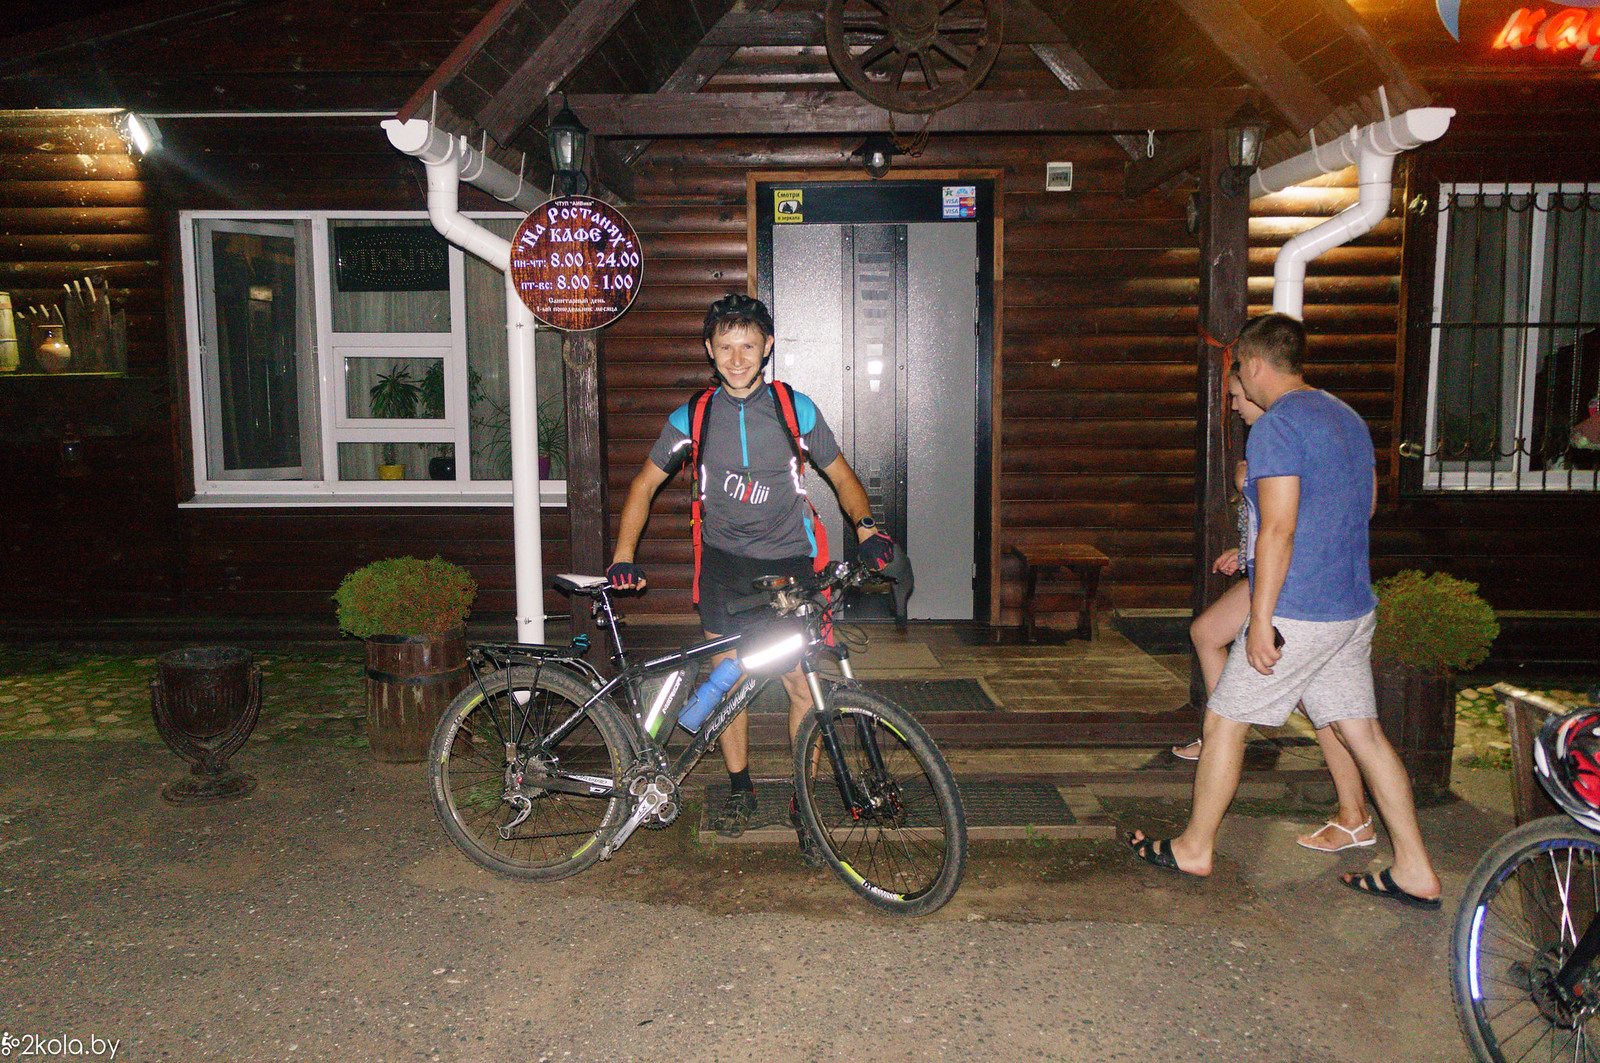 36262331961 56a8d61896 h - Ночная велопокатушка 2017 (Тимковичи - Люща)